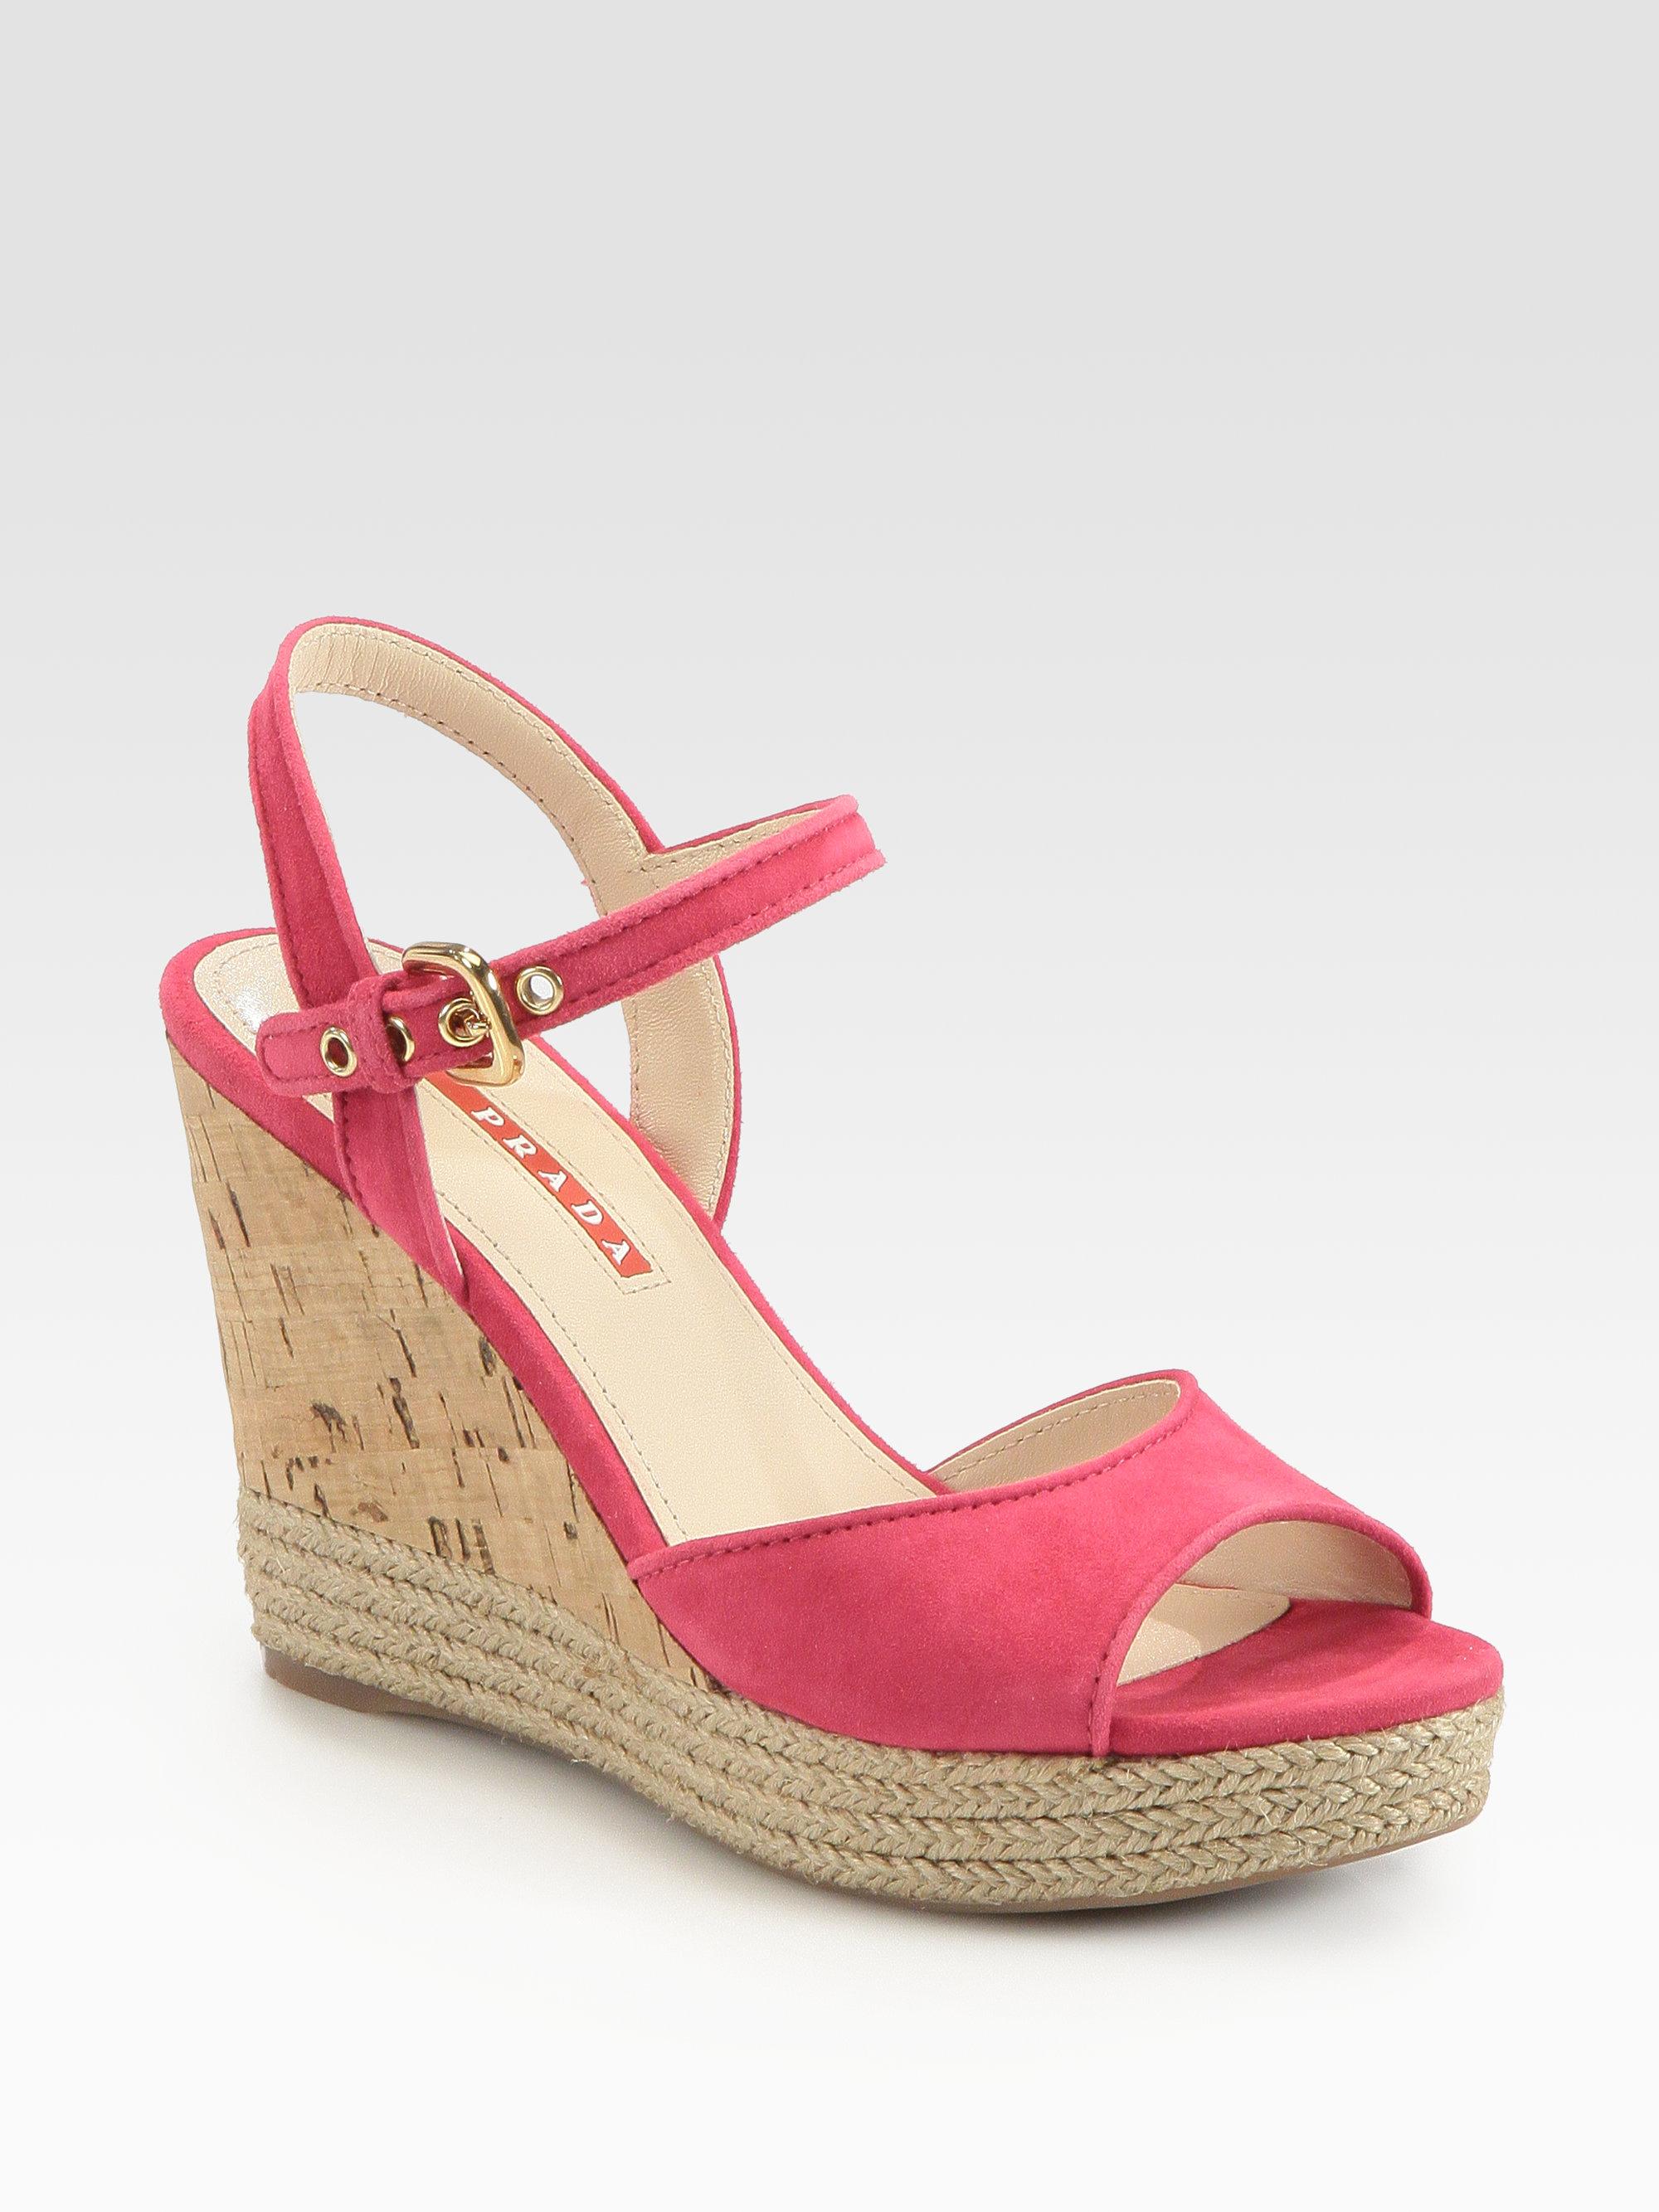 8573fae68c Prada Suede Cork Wedge Sandals in Pink - Lyst